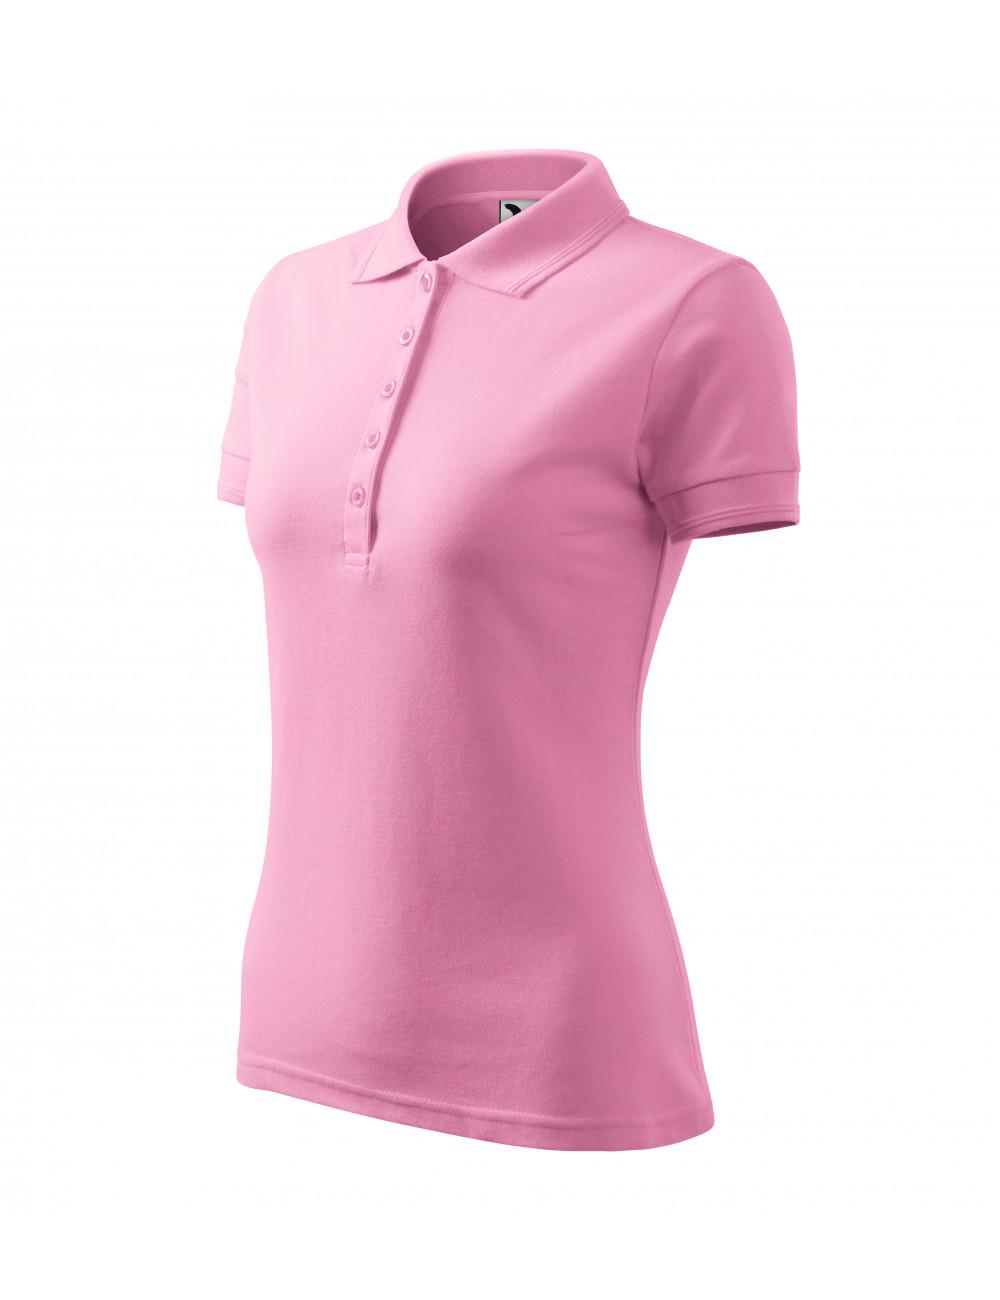 Adler MALFINI Koszulka polo damska Pique Polo 210 różowy